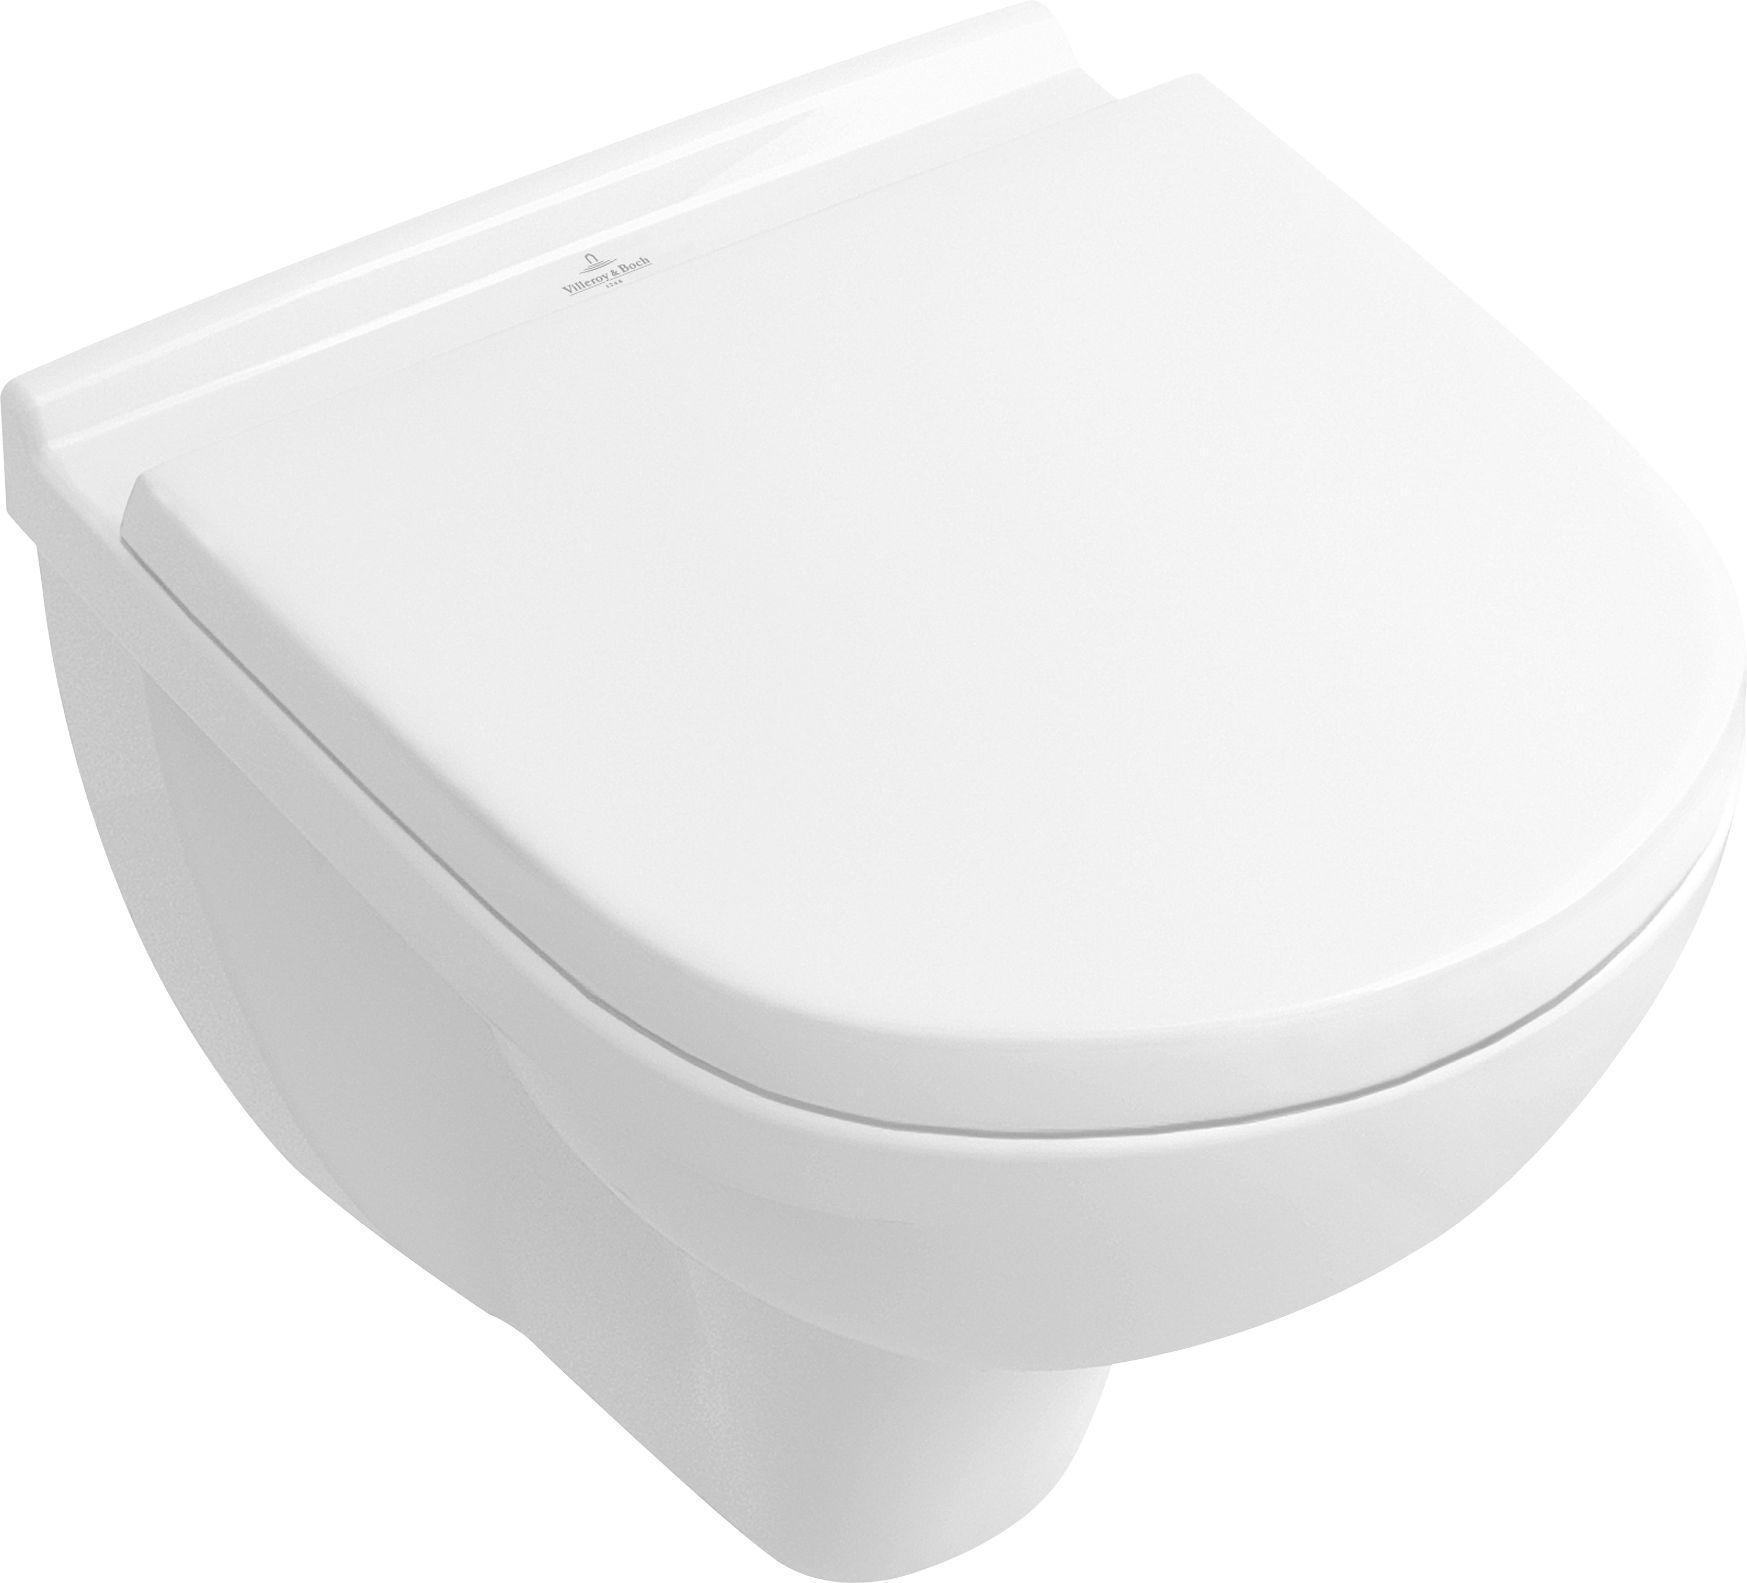 Villeroy & Boch O.Novo Compact Tiefspül-Wand-WC L:49xB:36cm DirectFlush mit offenem Spülrand weiß 5688R001